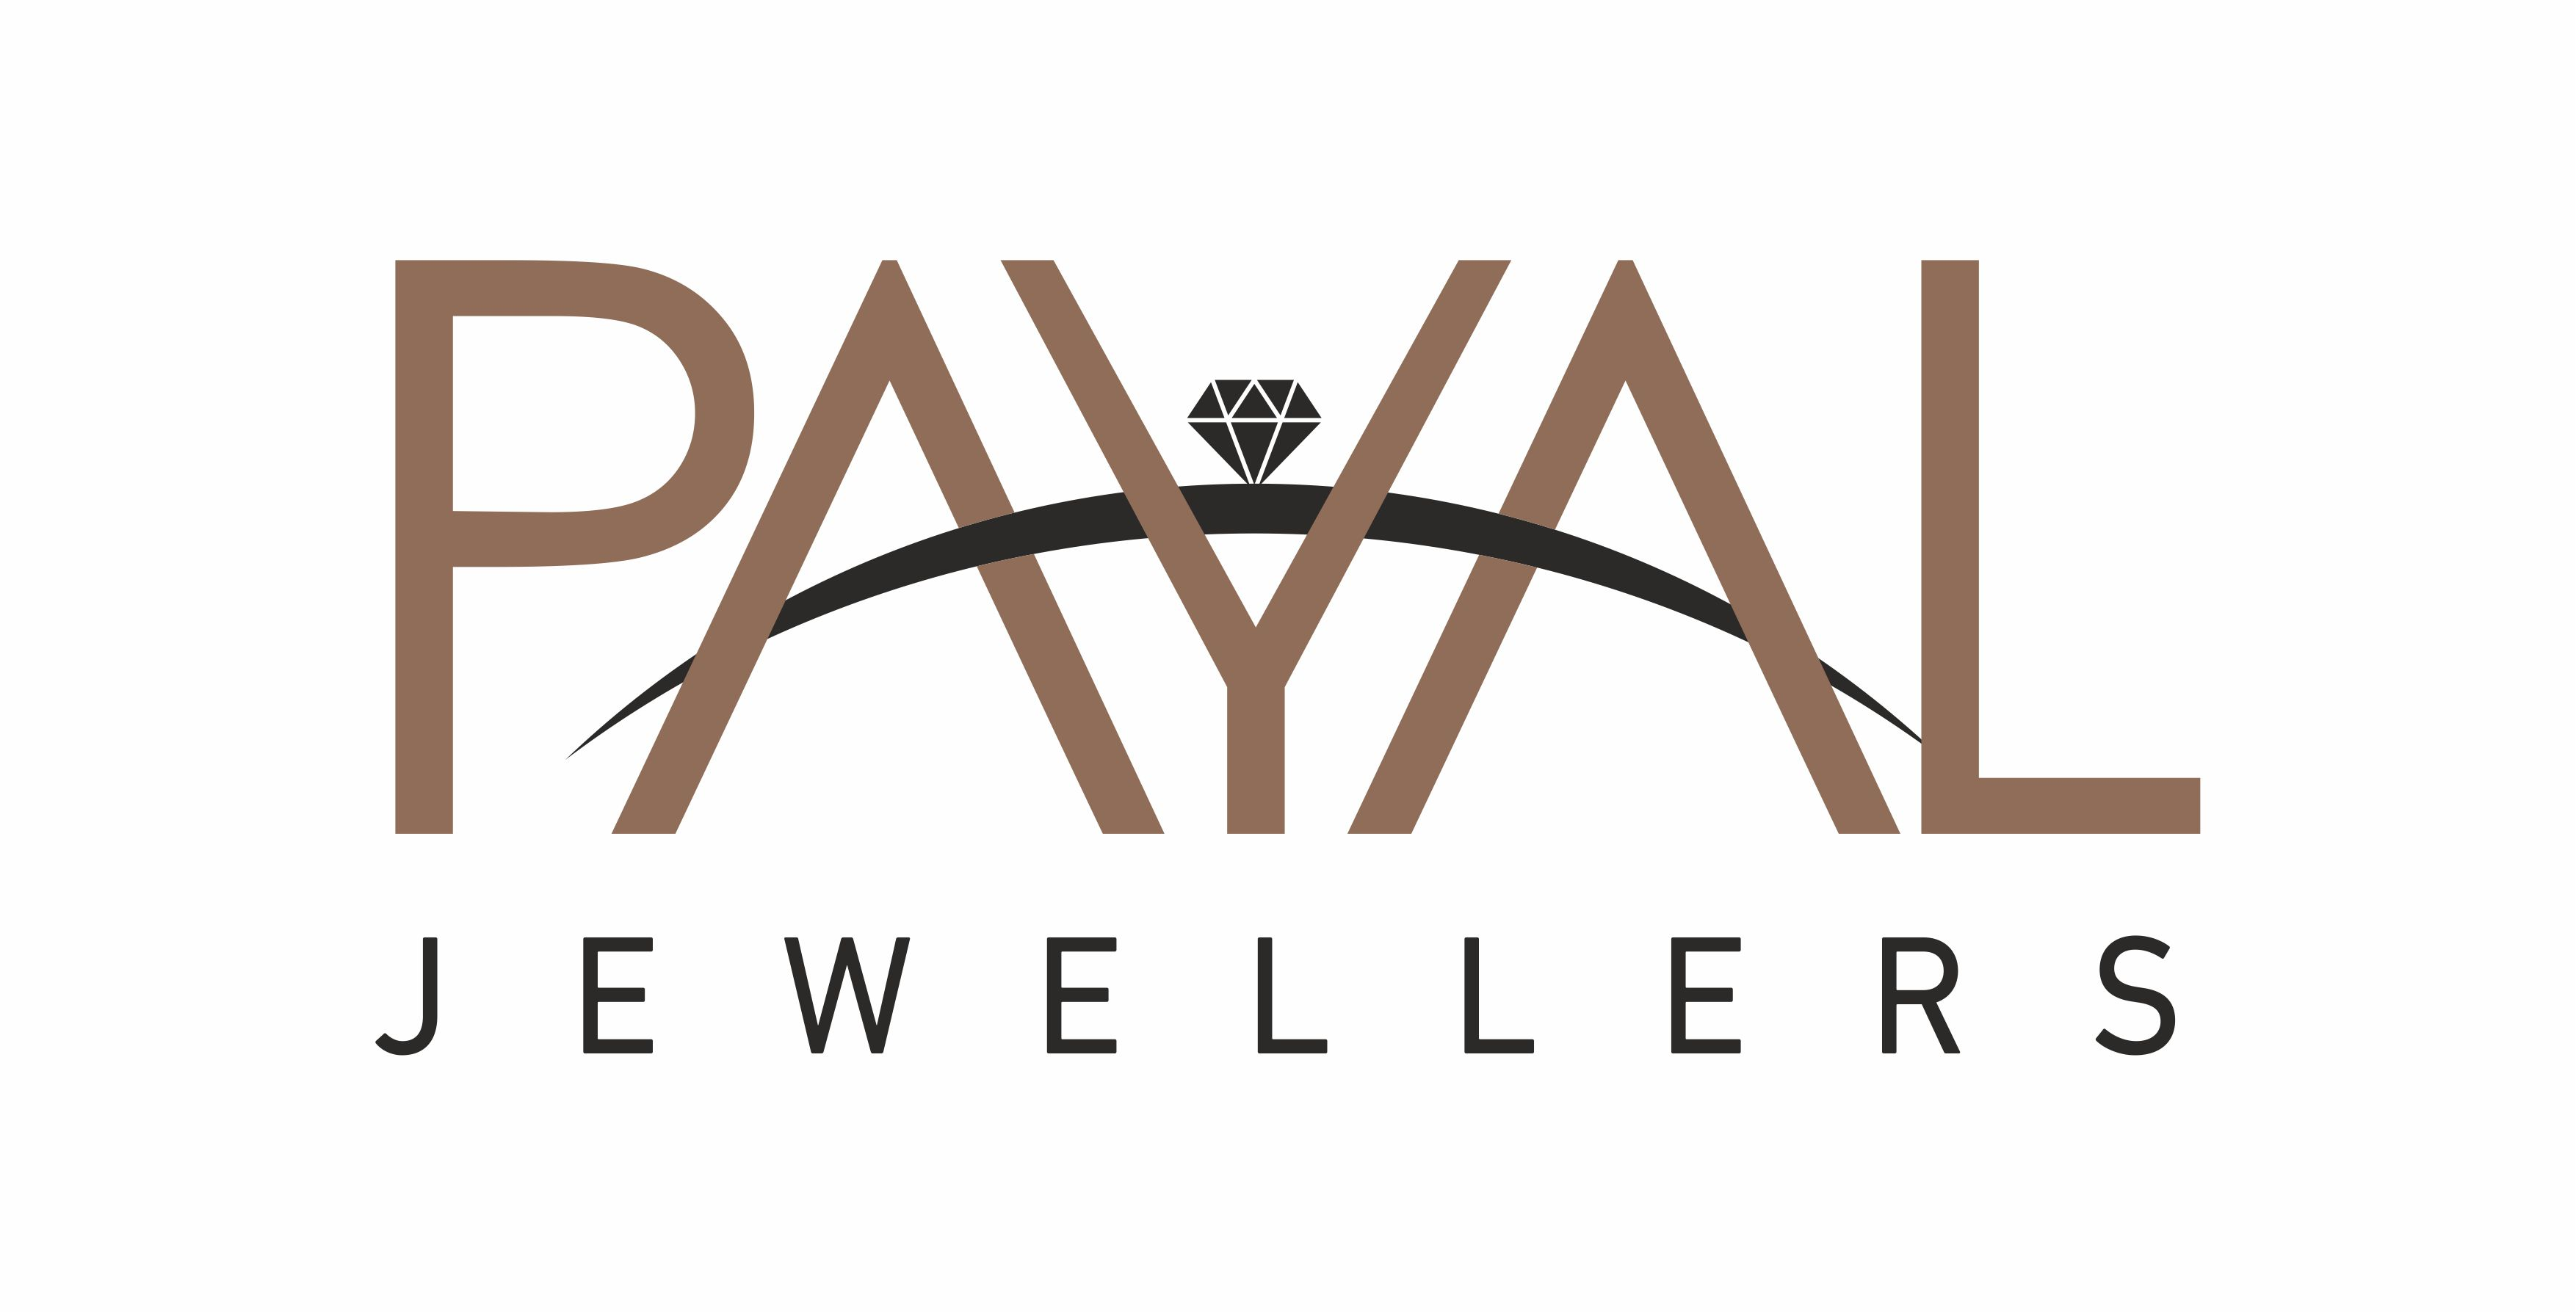 Payal jewellers